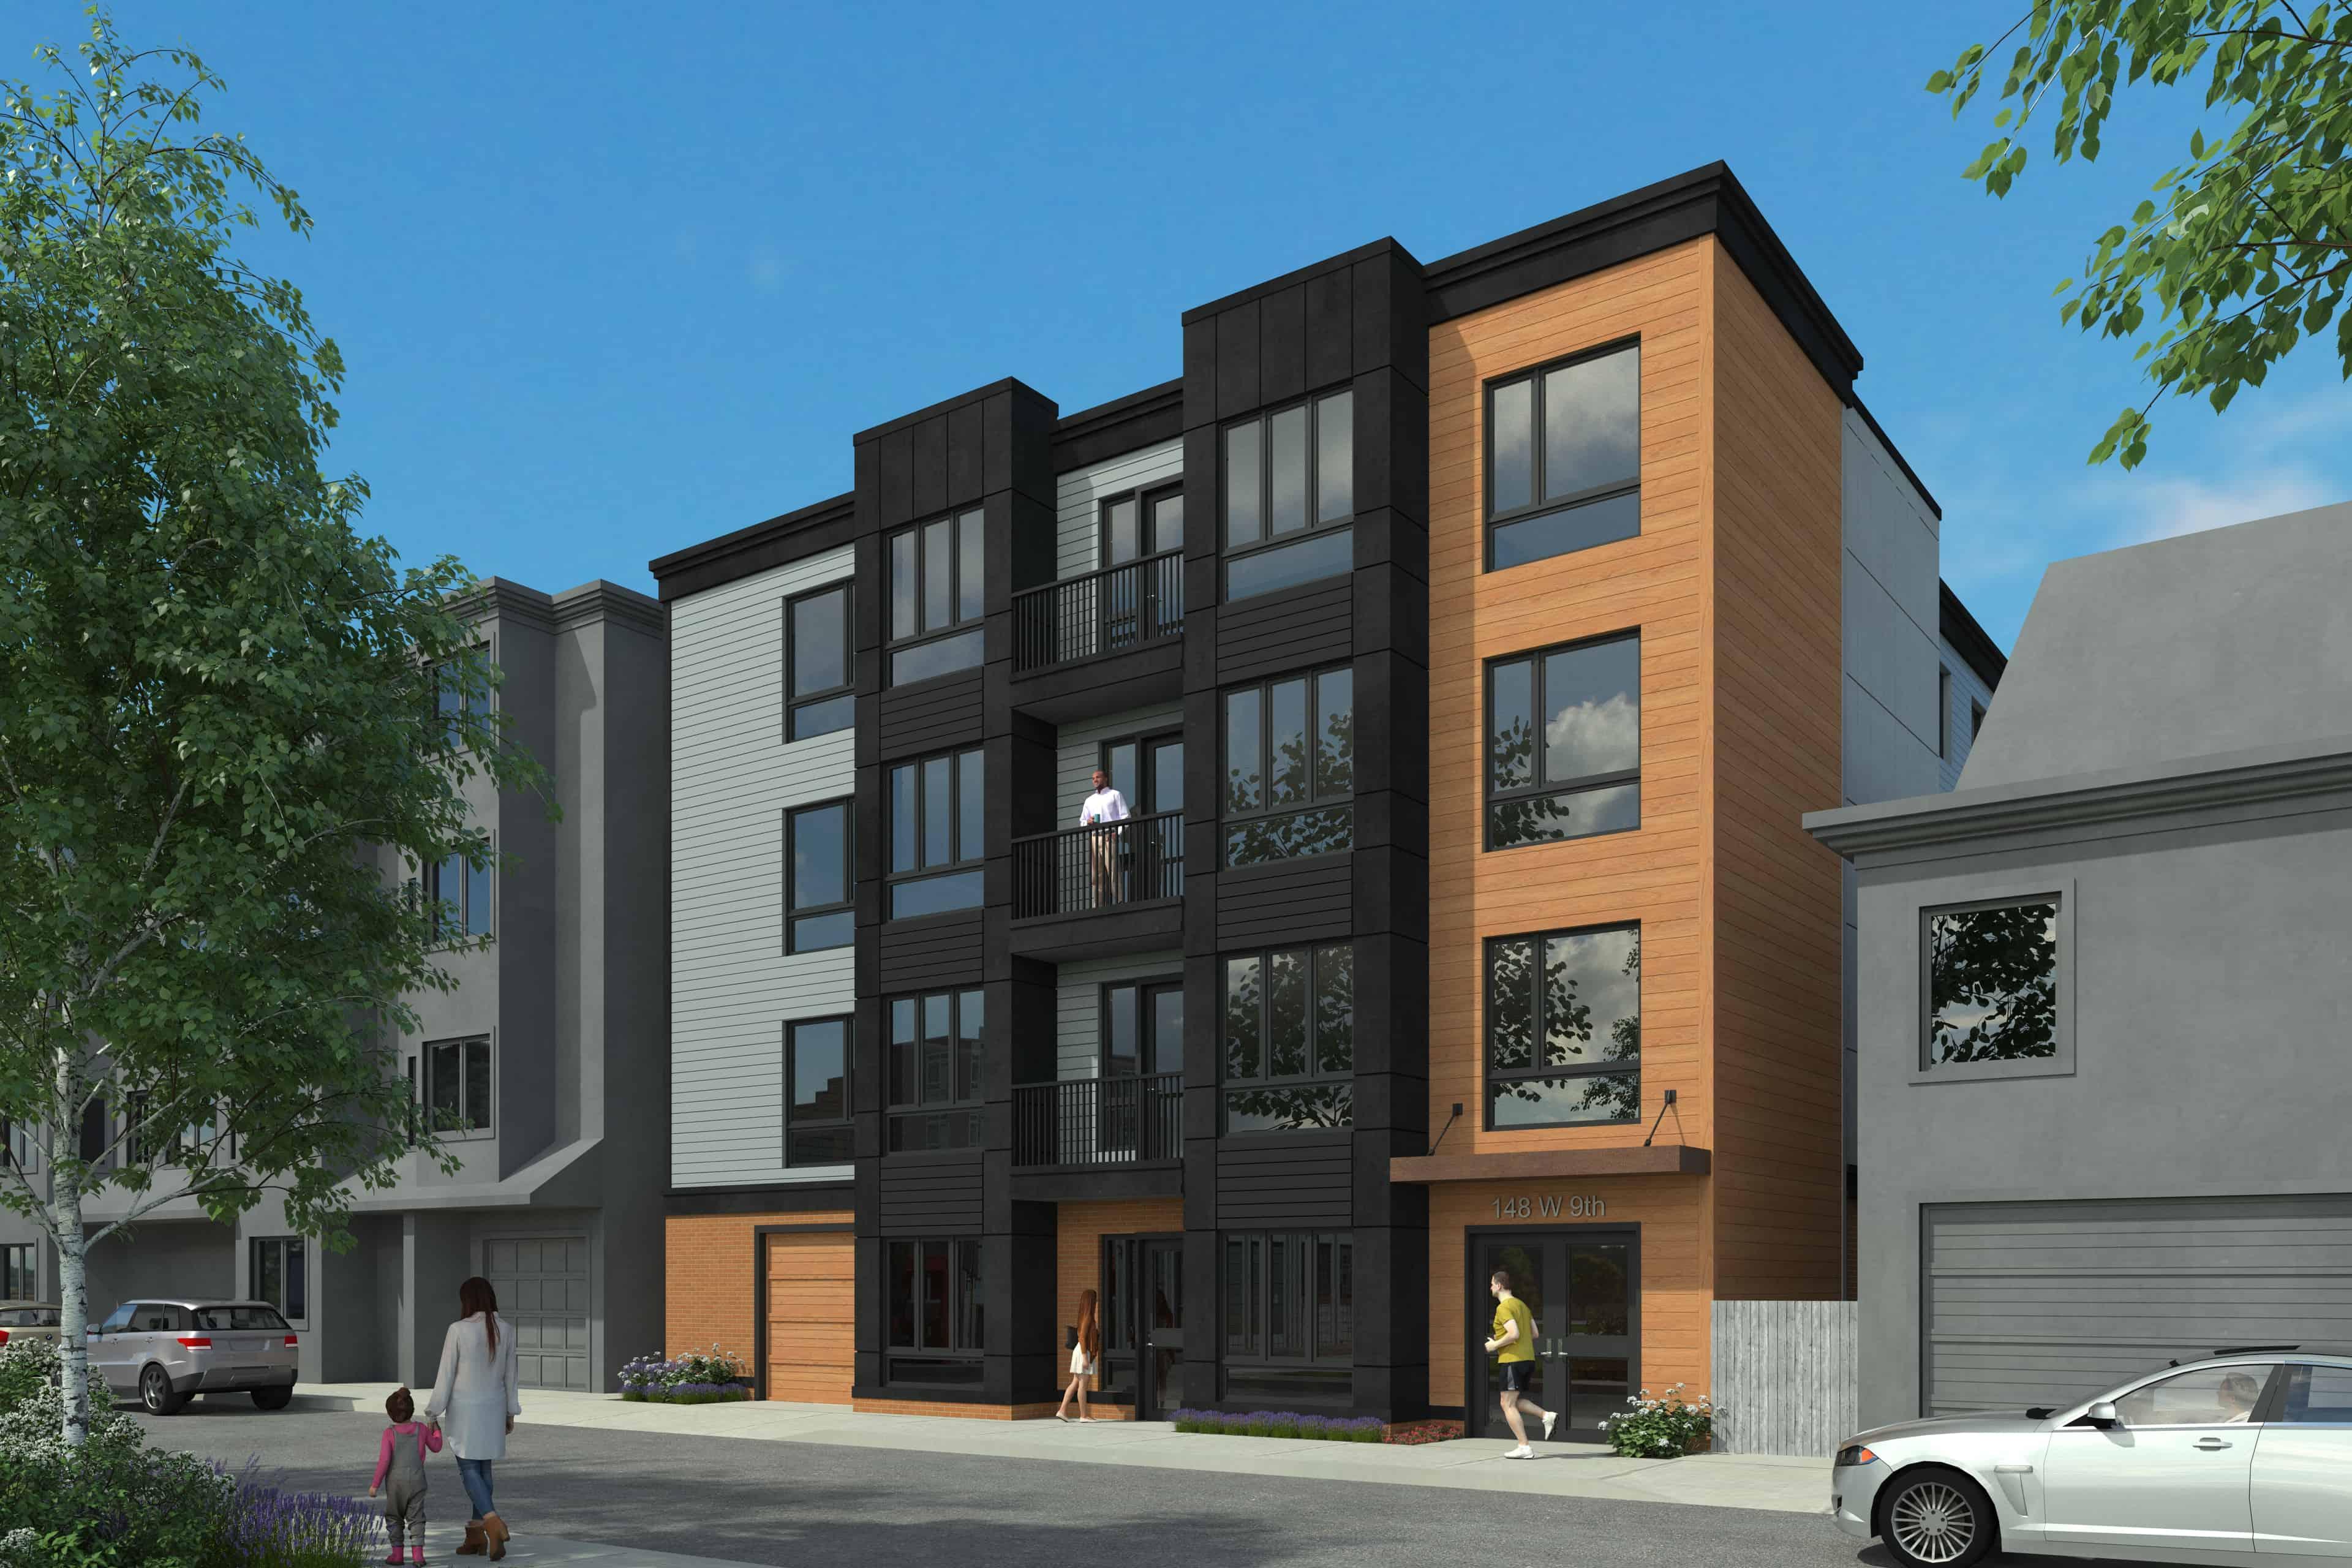 148 W 9th | South Boston New Construction Condos